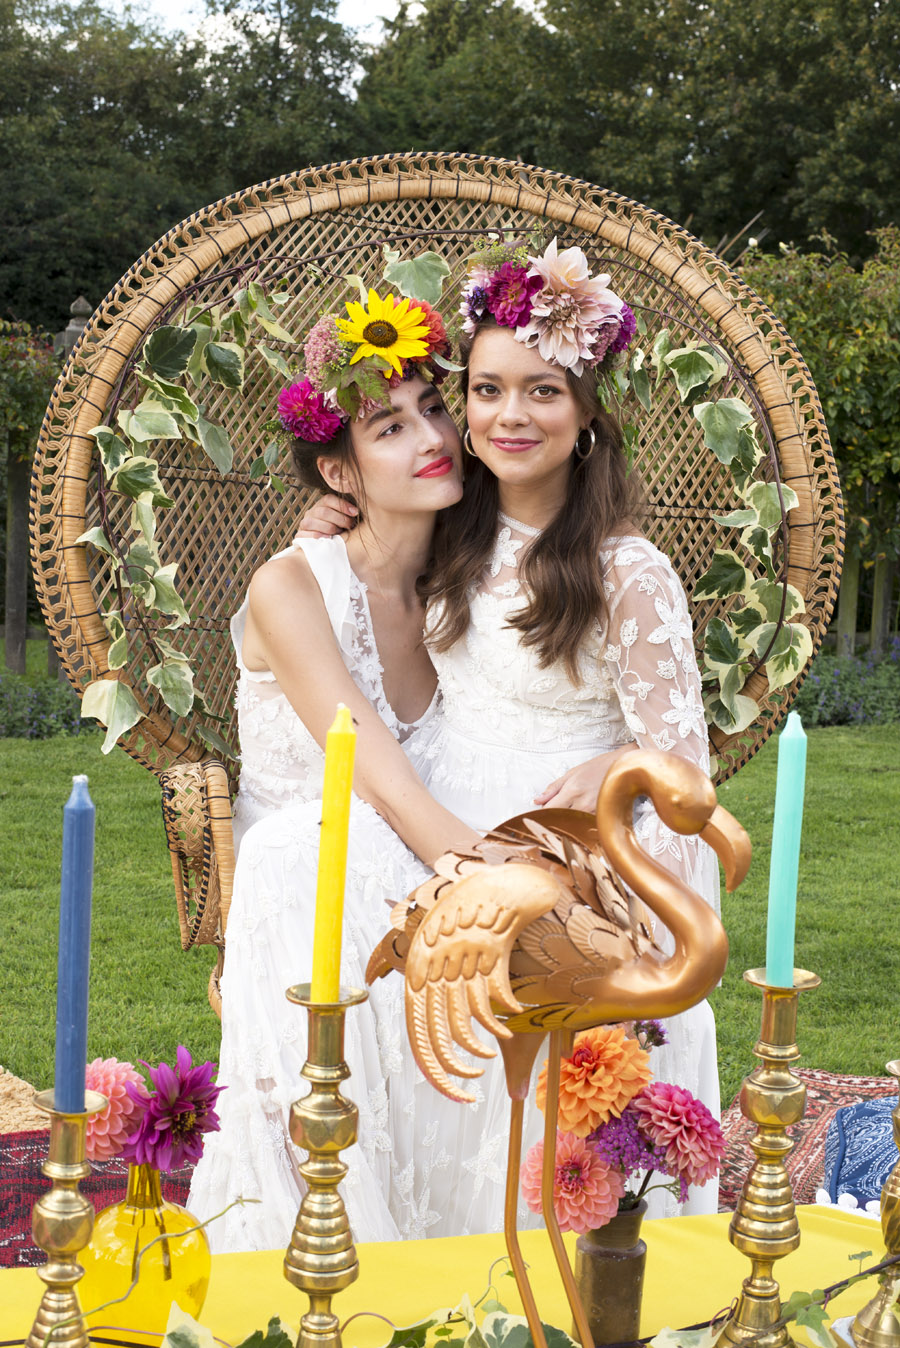 Same sex wedding styling boho chic festival inspiration - image credit Emma Hall Photography (21)